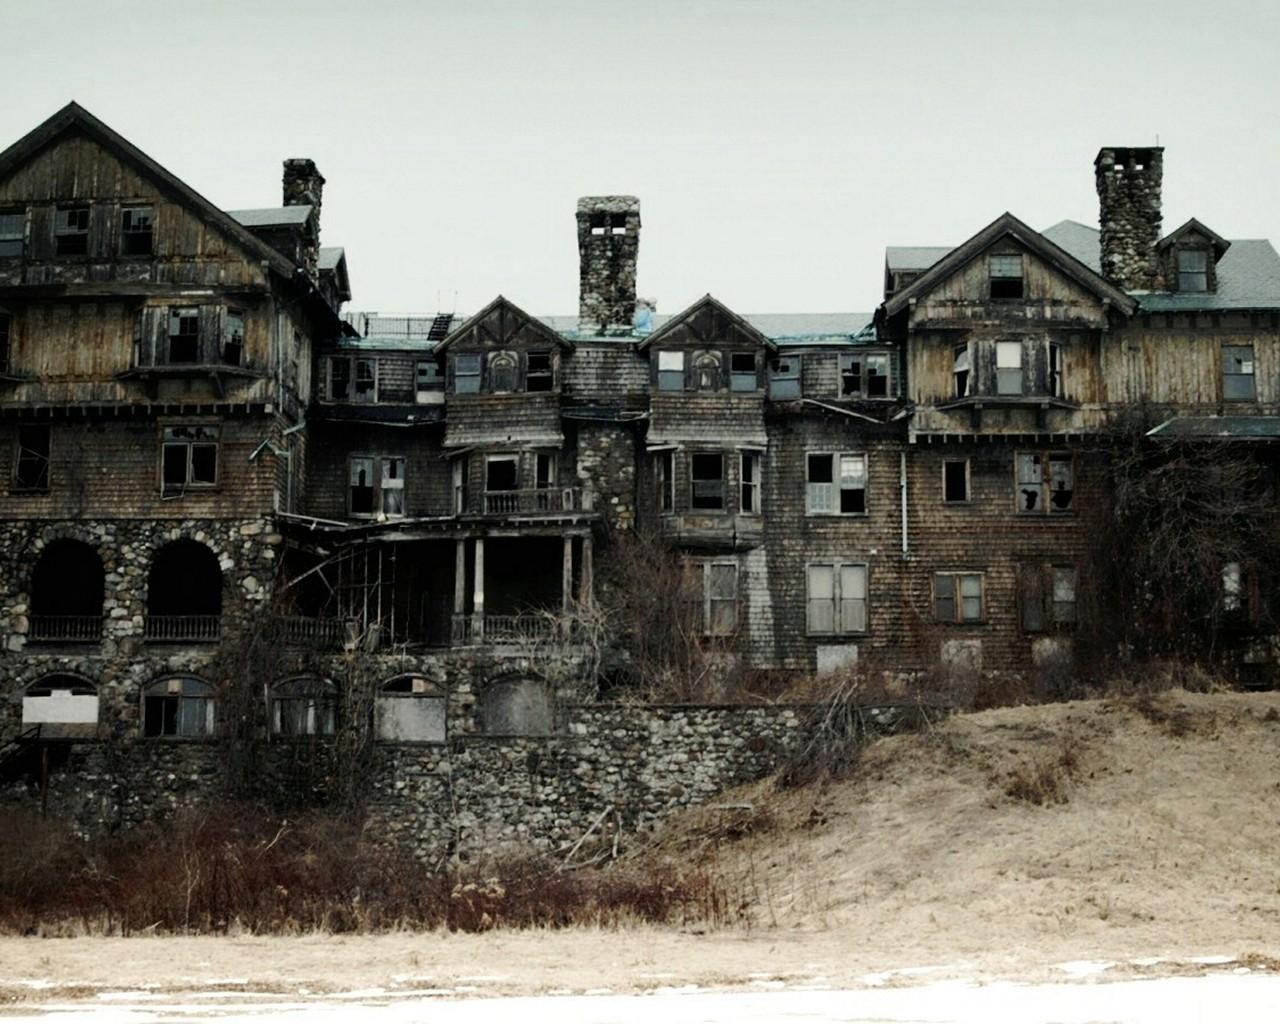 http://2.bp.blogspot.com/-OpP_m5Ln-AY/UaLA36SAmZI/AAAAAAAAR9o/u4ZifwgLRMk/s1600/old-architecture-houses-buildings-abandoned-abandoned-house-1440x900-hd-wallpaper.jpg